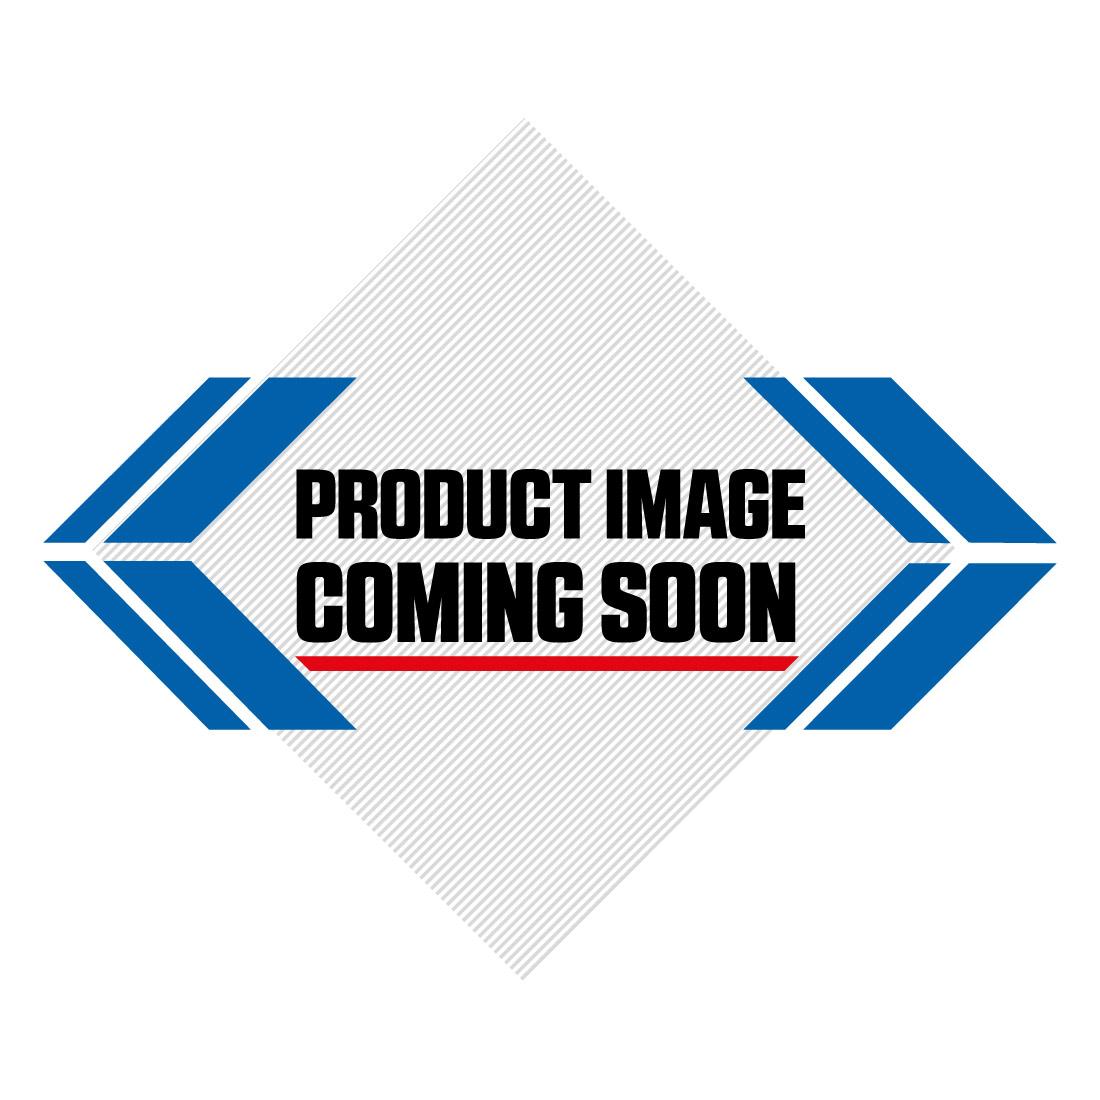 DJI Mavic Pro Platinum Drone Image-2>